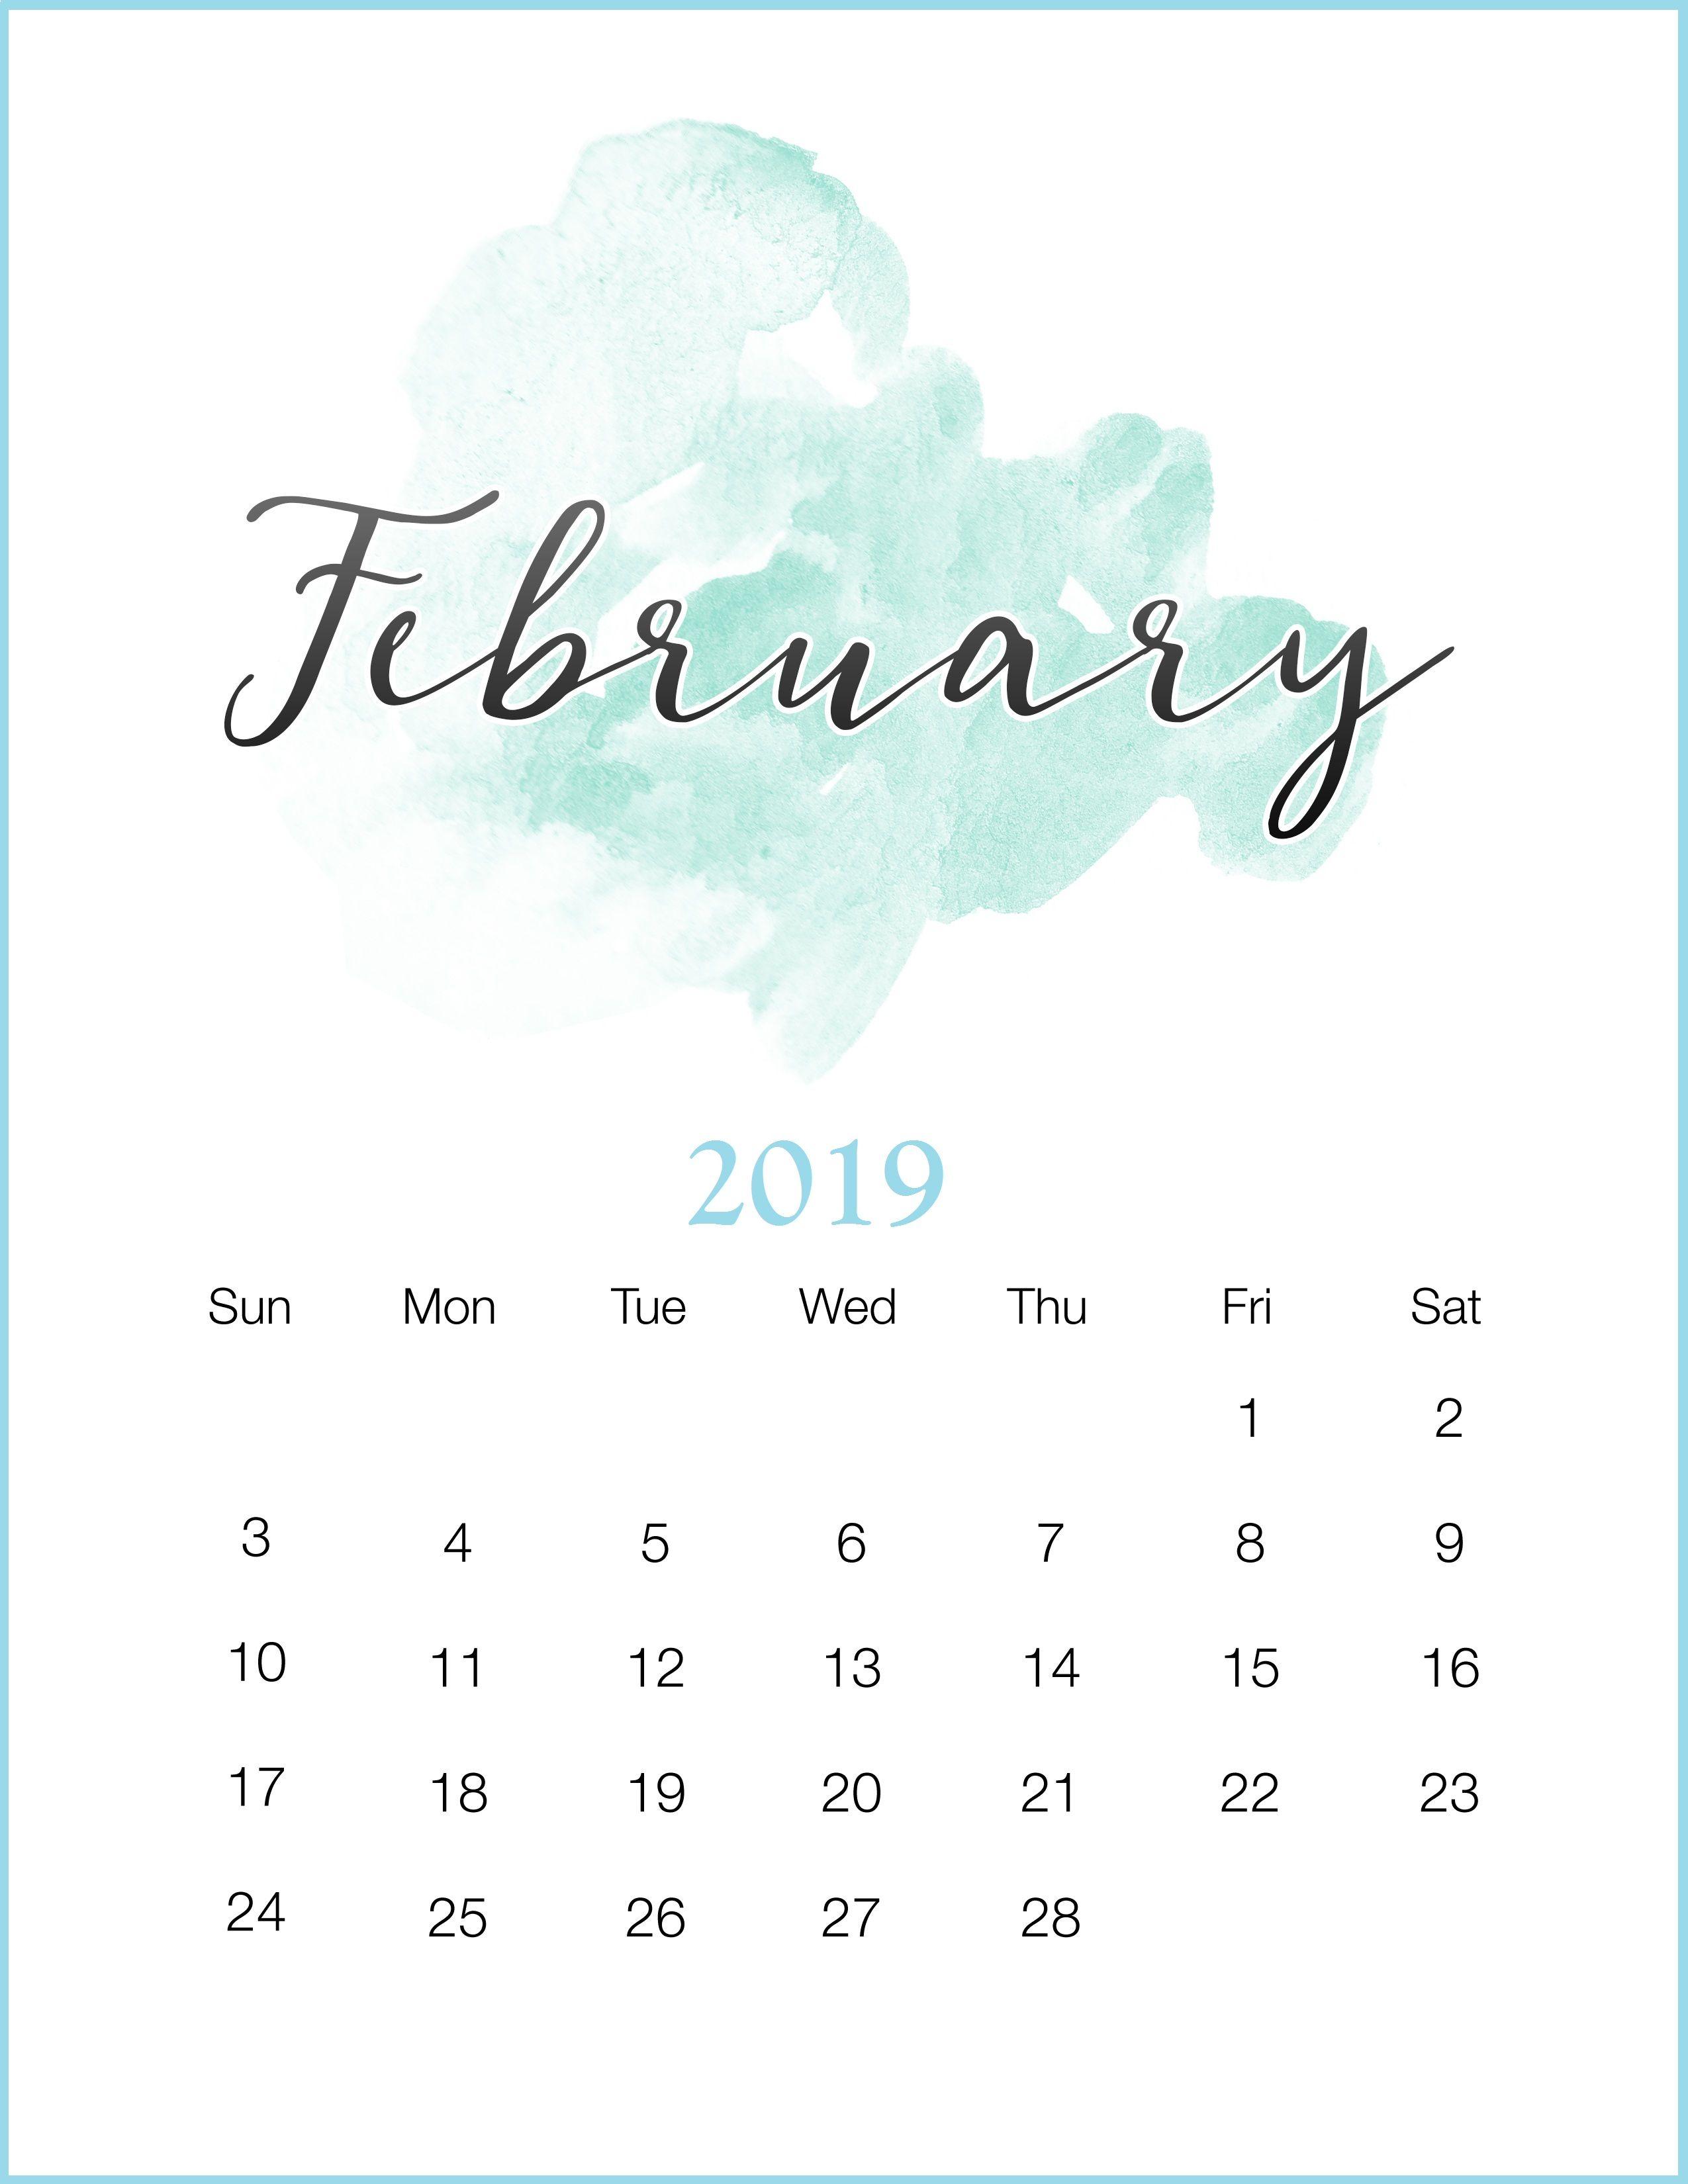 Watercolor 2019 February Printable Calendar #february2019